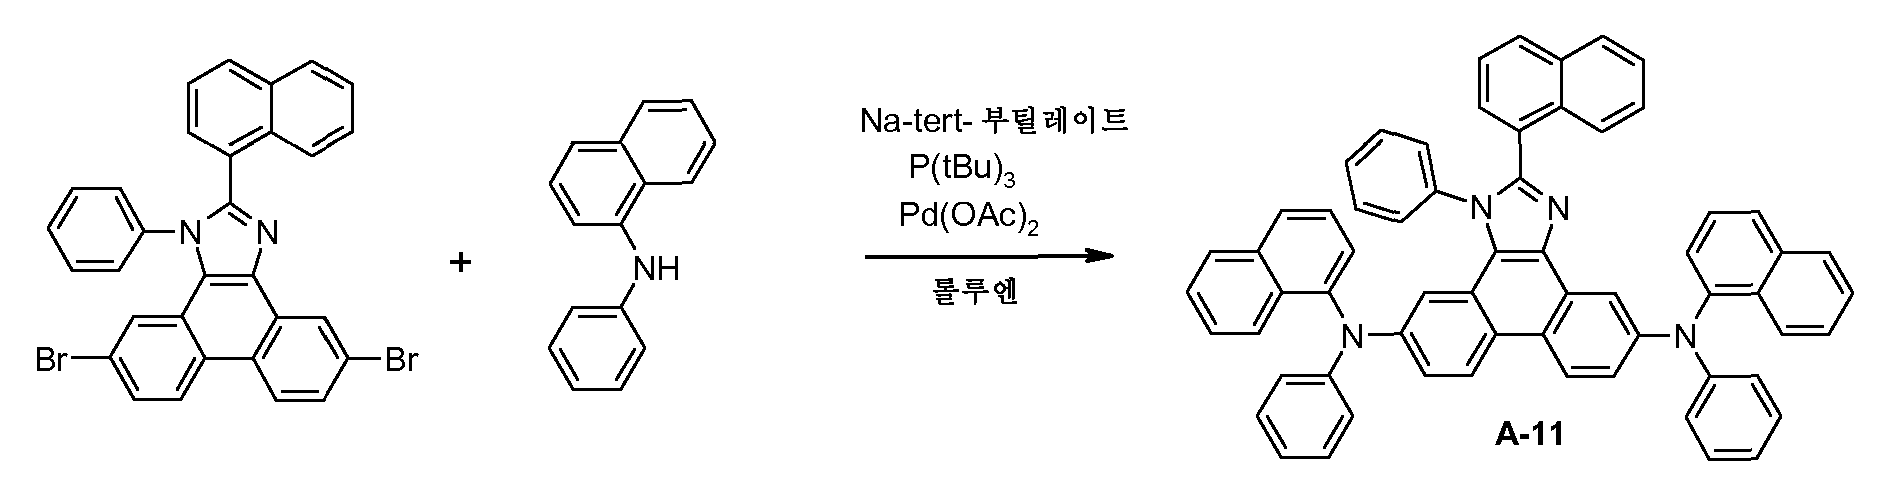 Figure 112012004234516-pct00056